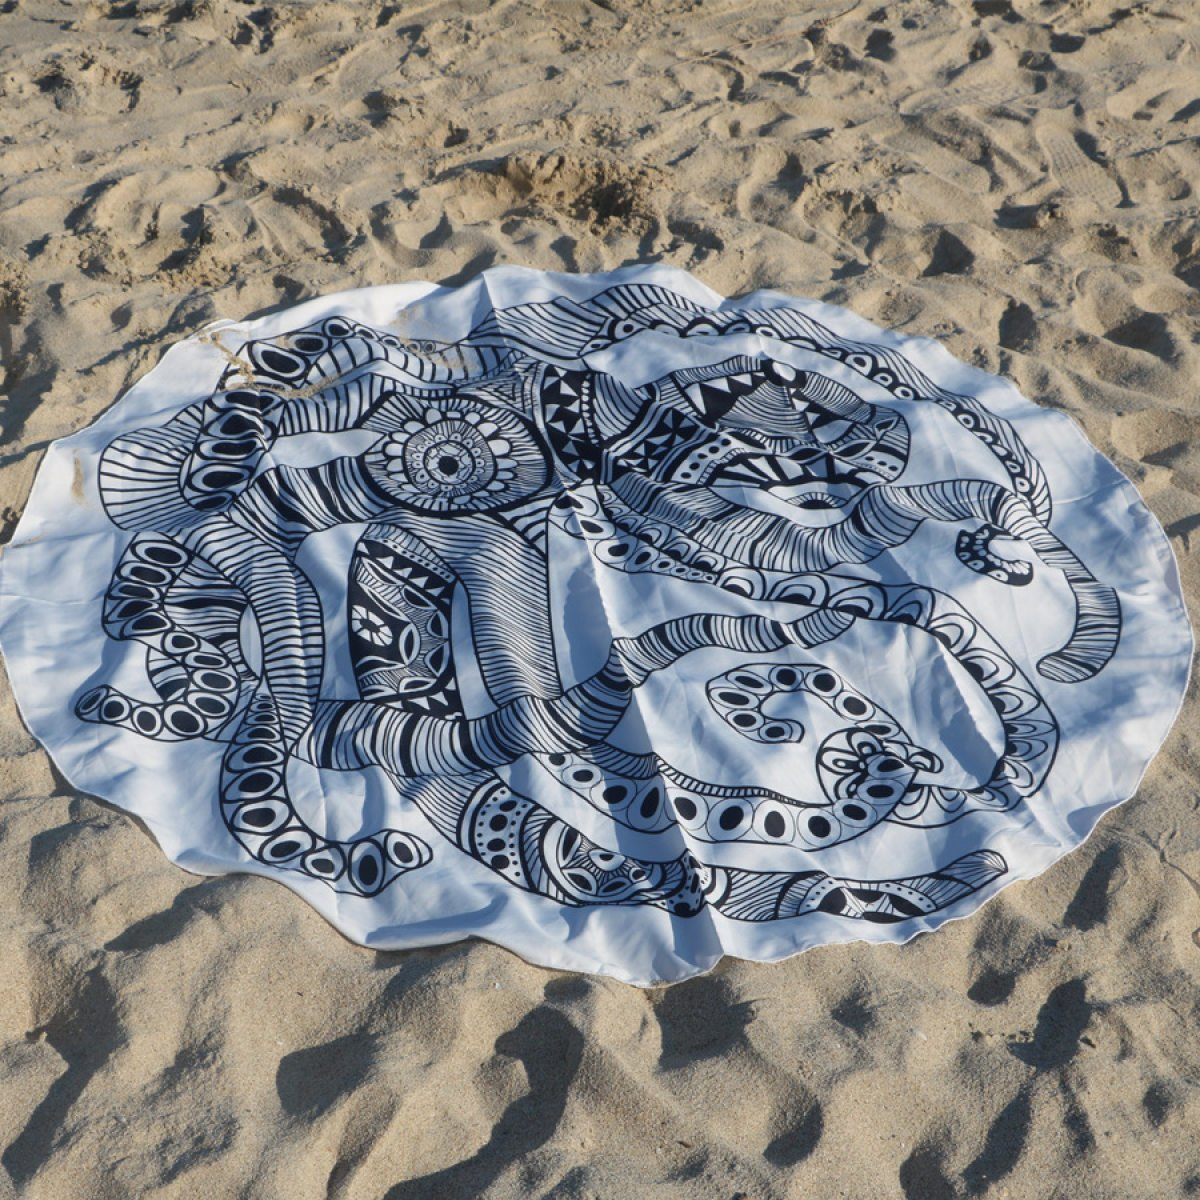 Verano Indio Mandala Redondo Toalla De Playa Hippie Letra Grande Flor Bata Acrílico Diámetro De 150 Cm 1 Patrones Diferentes,1: Amazon.es: Hogar